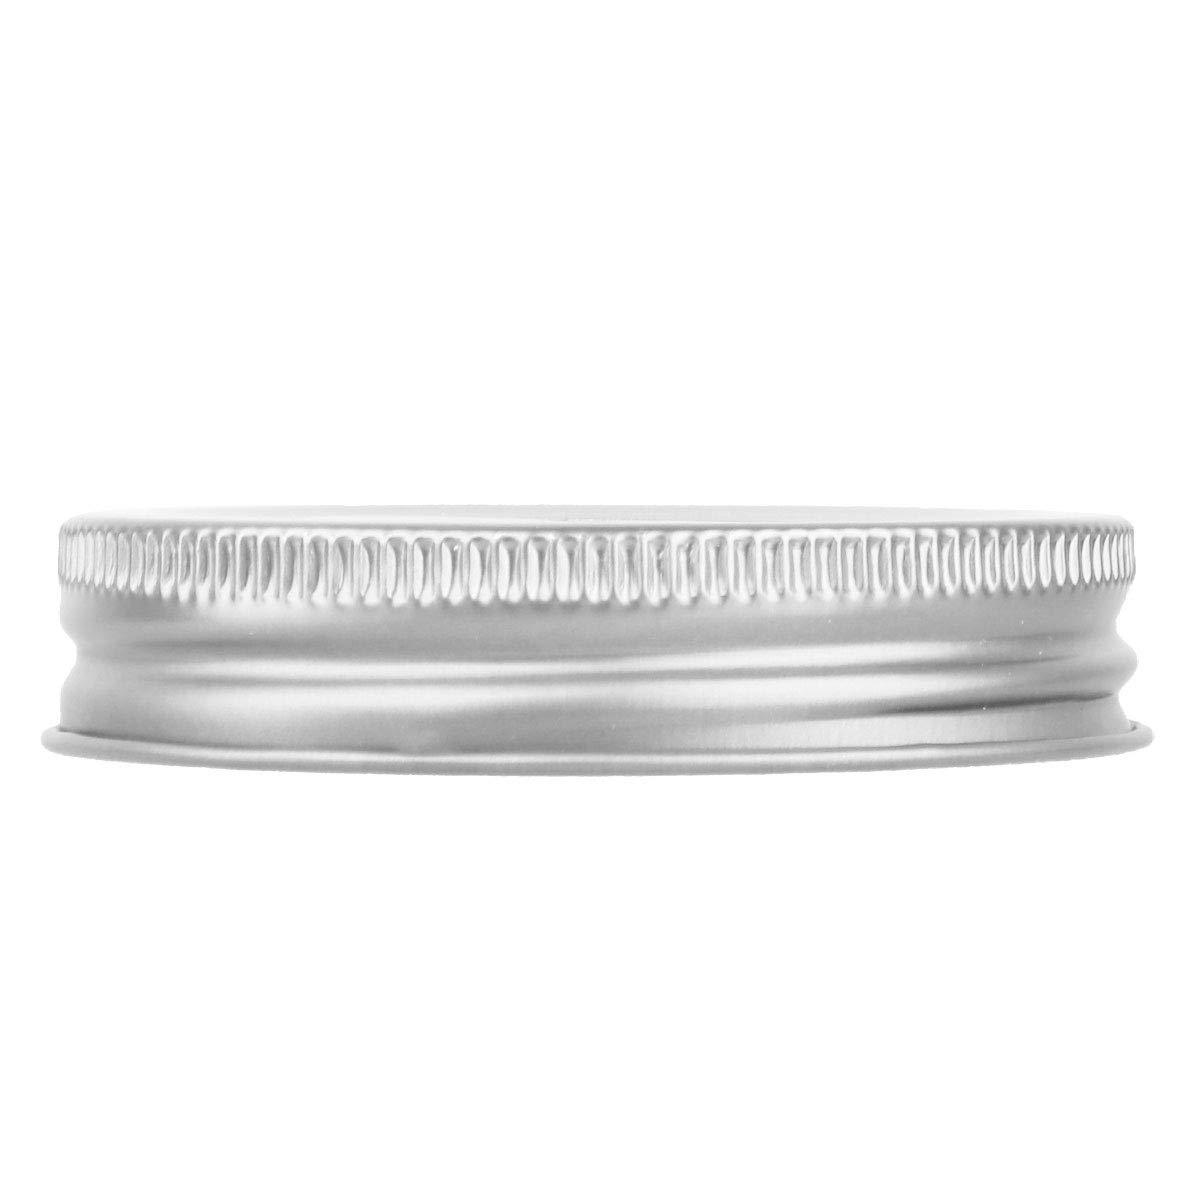 TiaoBug 8 Pieces Metal Coin Slot Bank Lids for Mason Jar Ball Canning Jars Silver One Size by TiaoBug (Image #4)